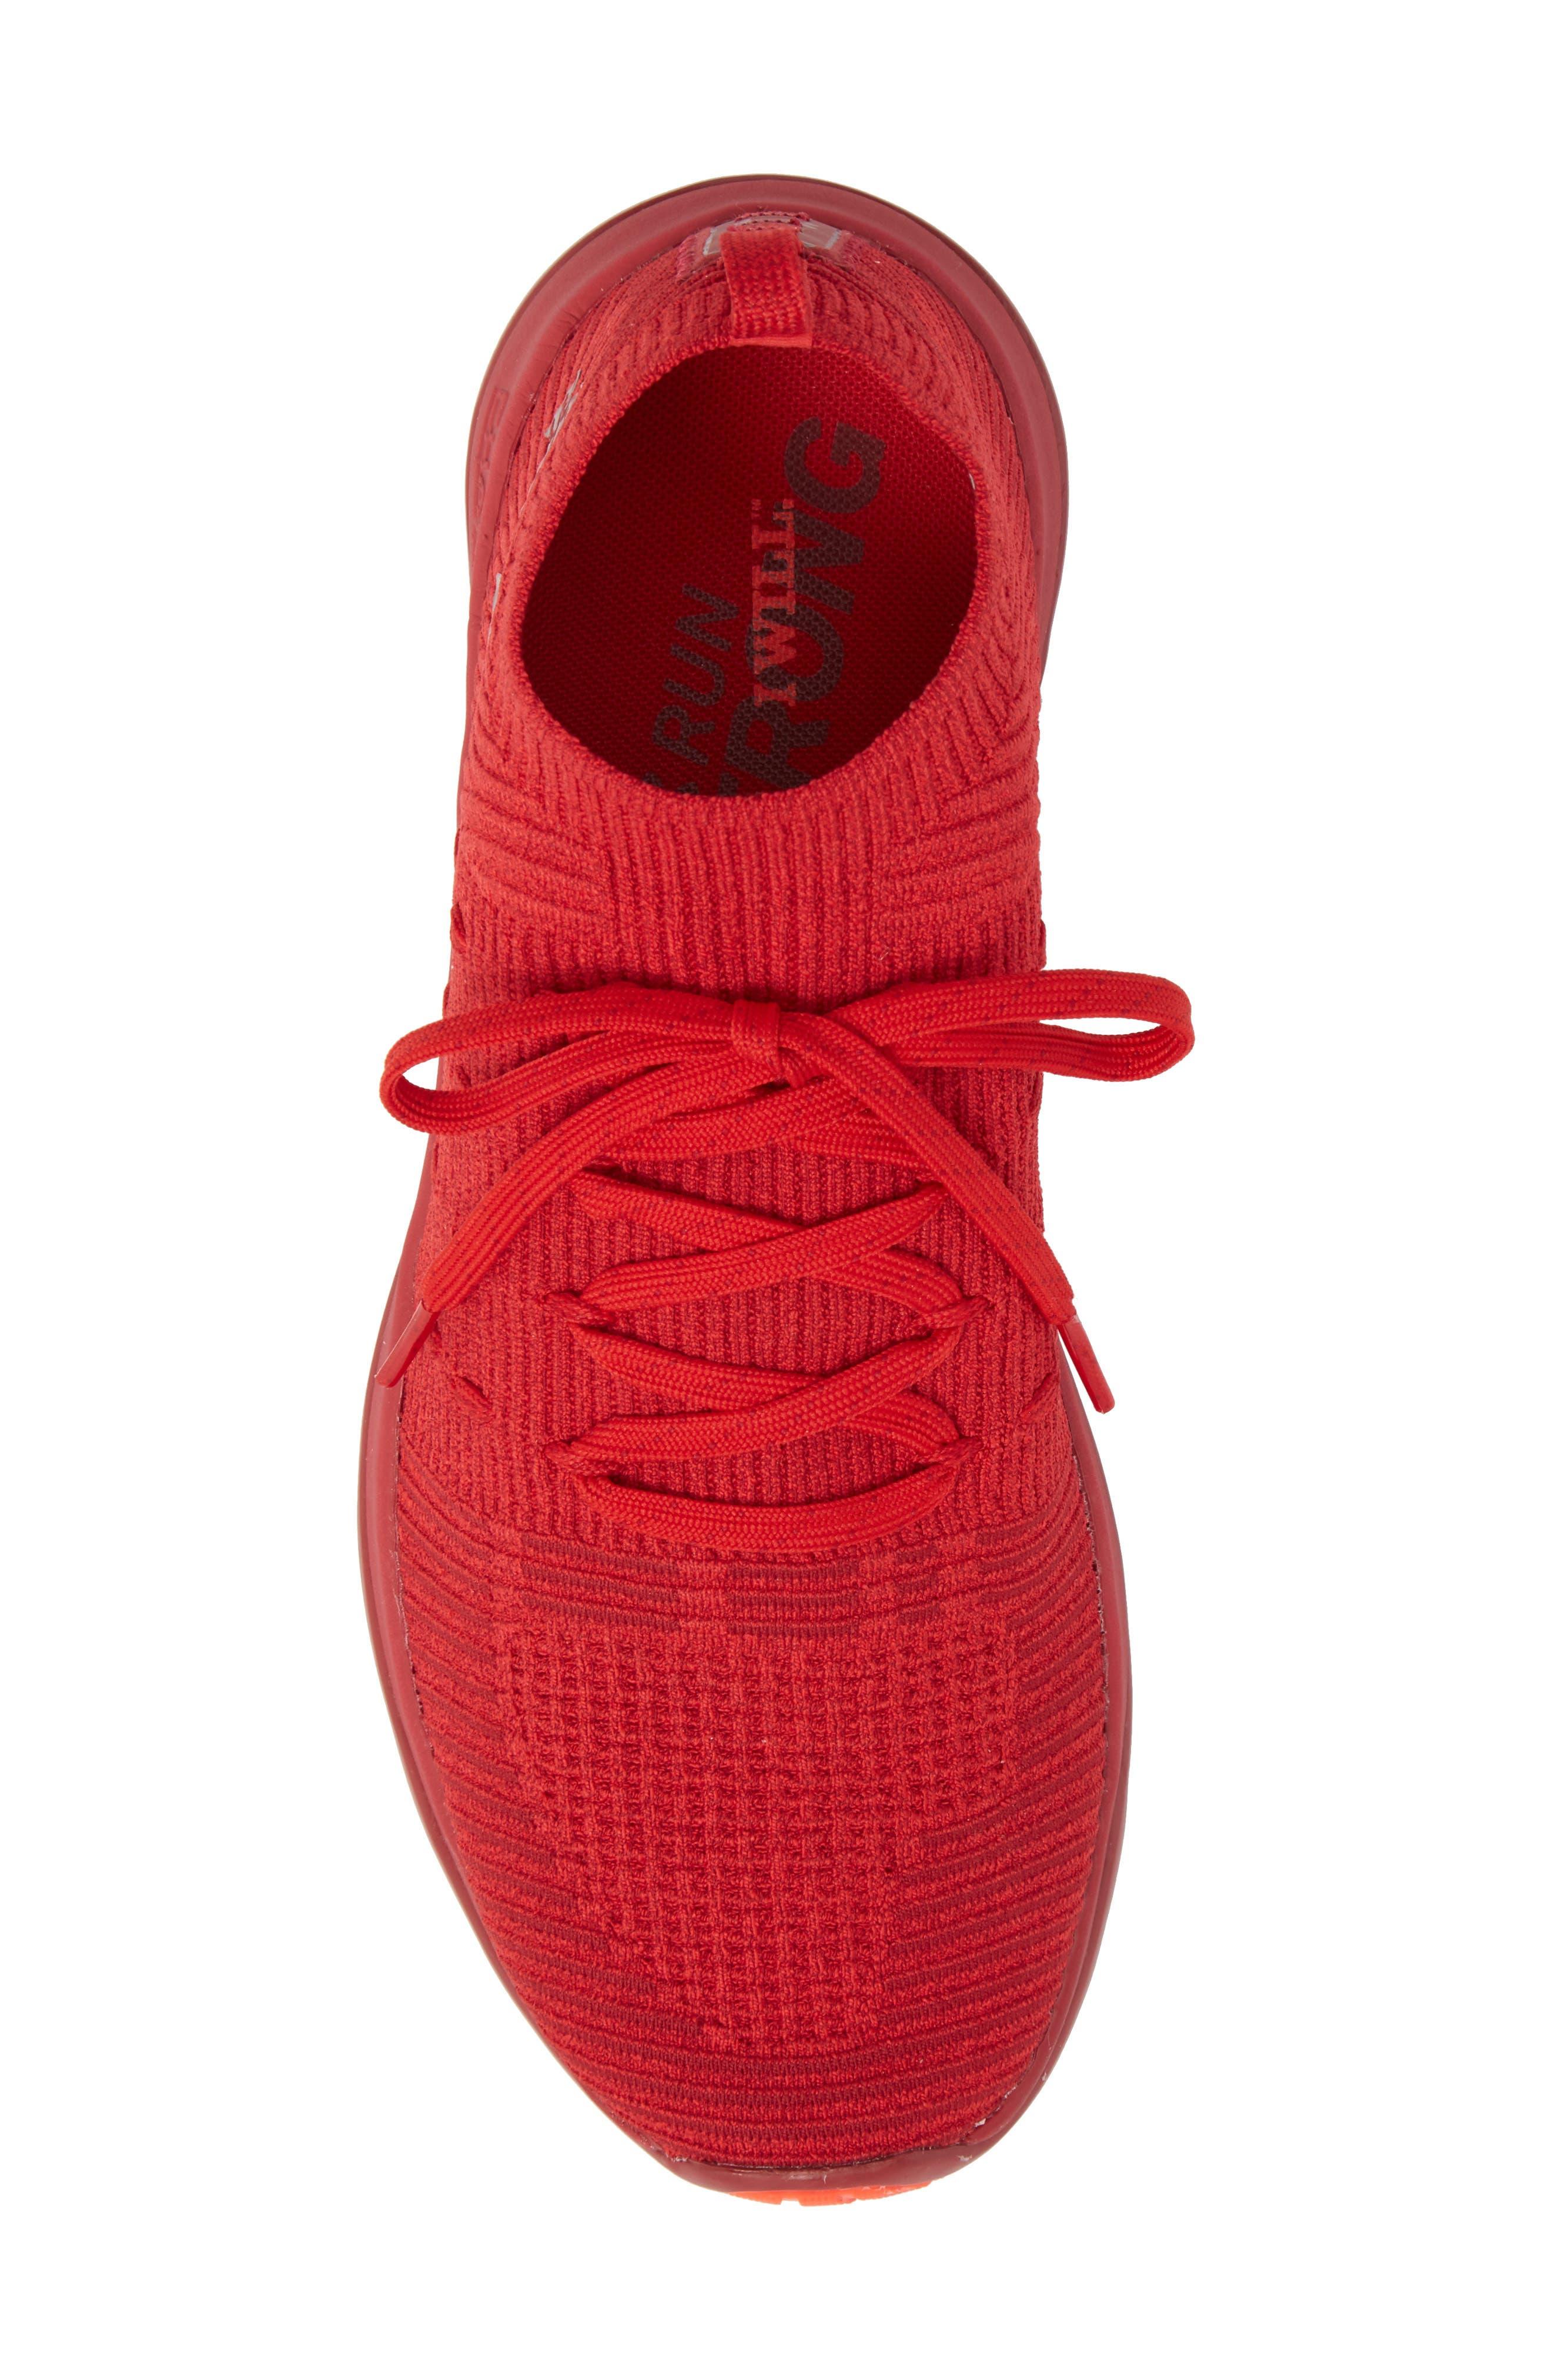 Slingflex Rise Sneaker,                             Alternate thumbnail 5, color,                             Pierce/ Spice Red